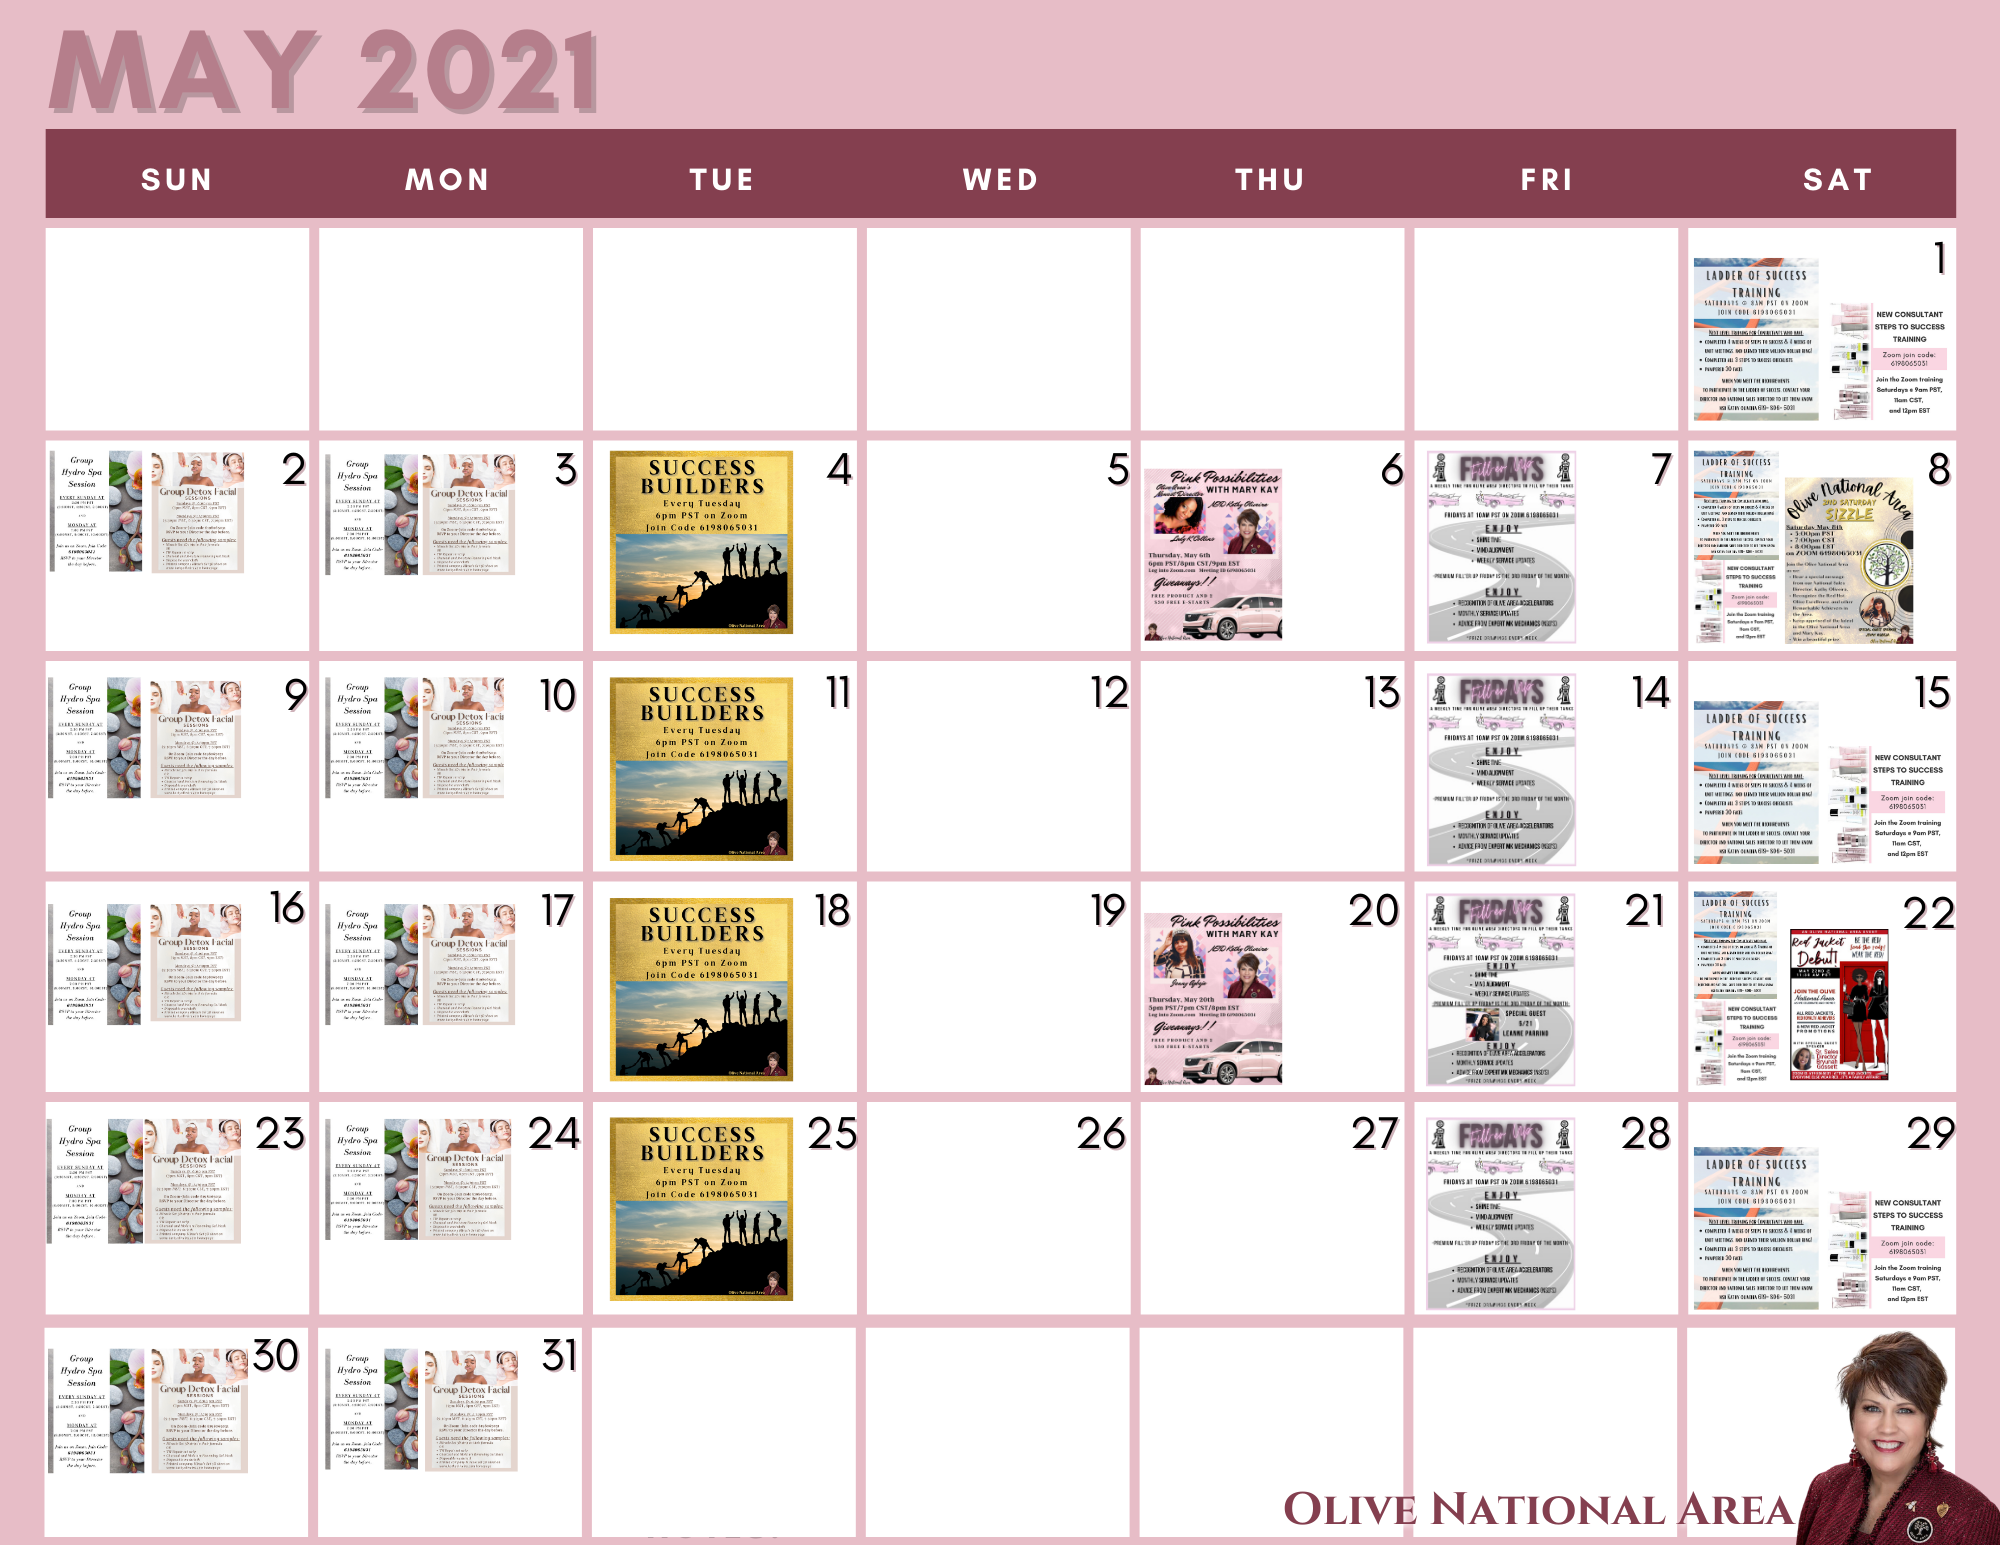 May 2021 flyer calendar